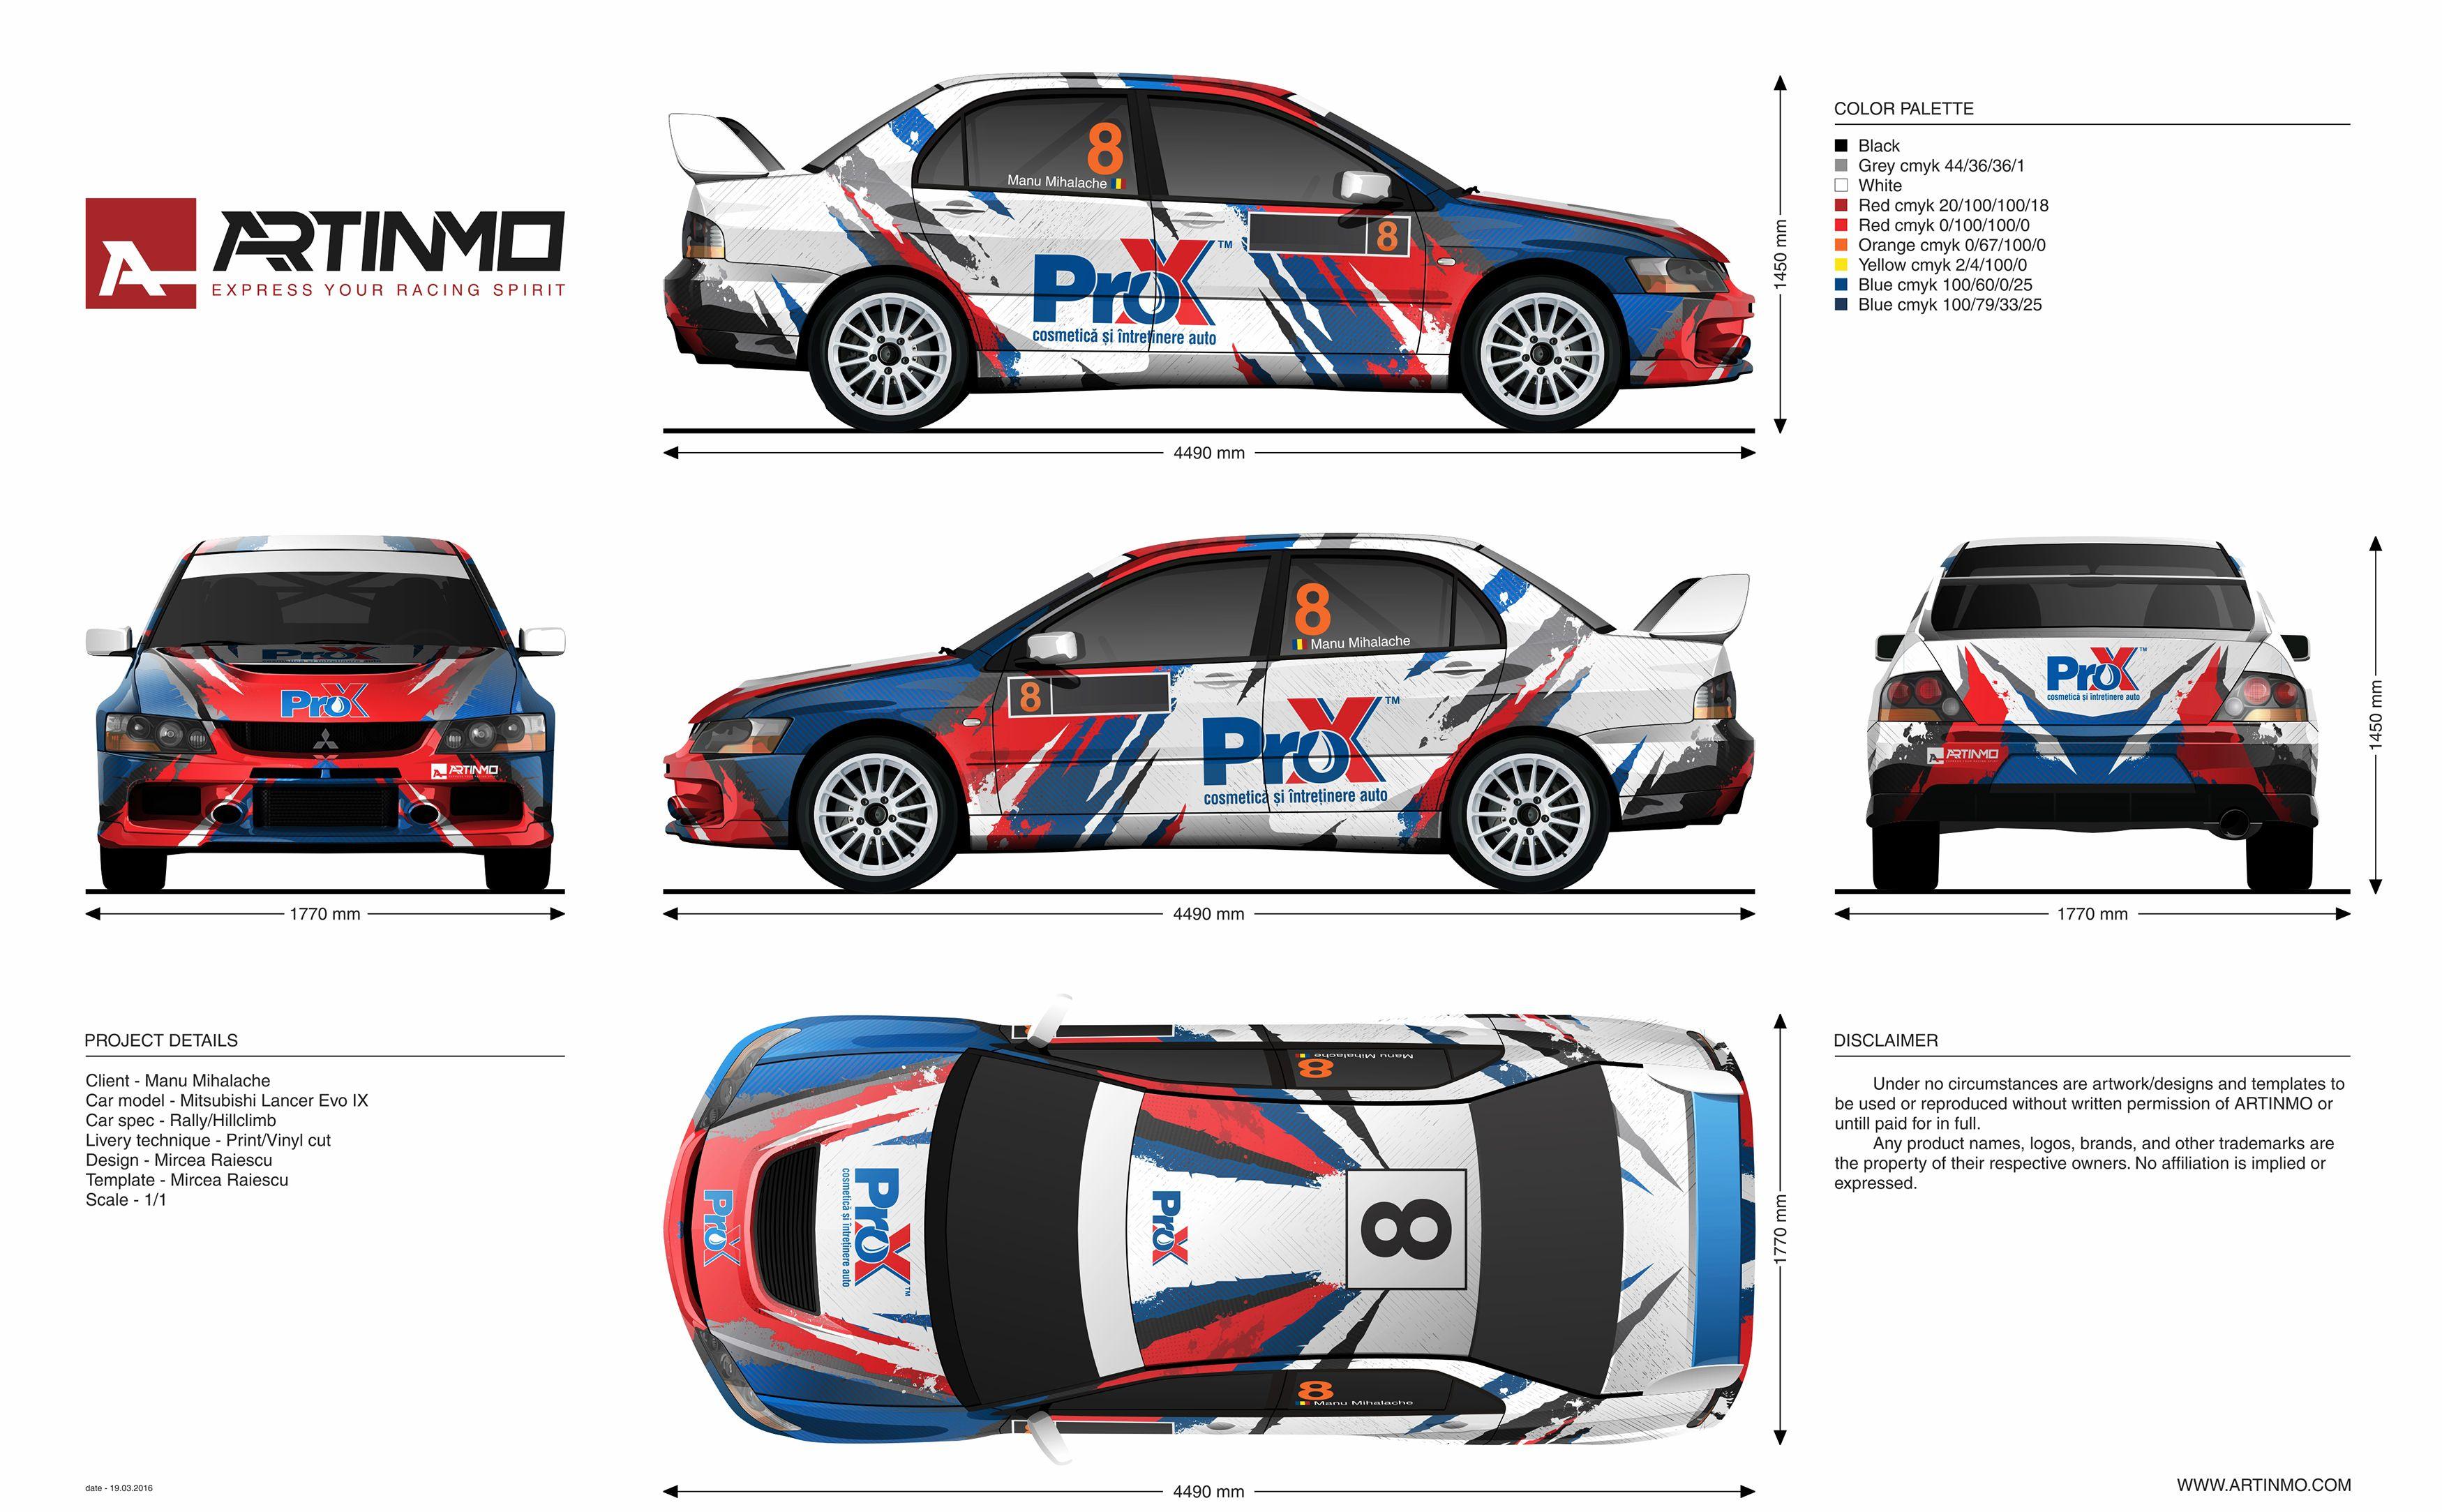 ProX lancer evo IX livery design